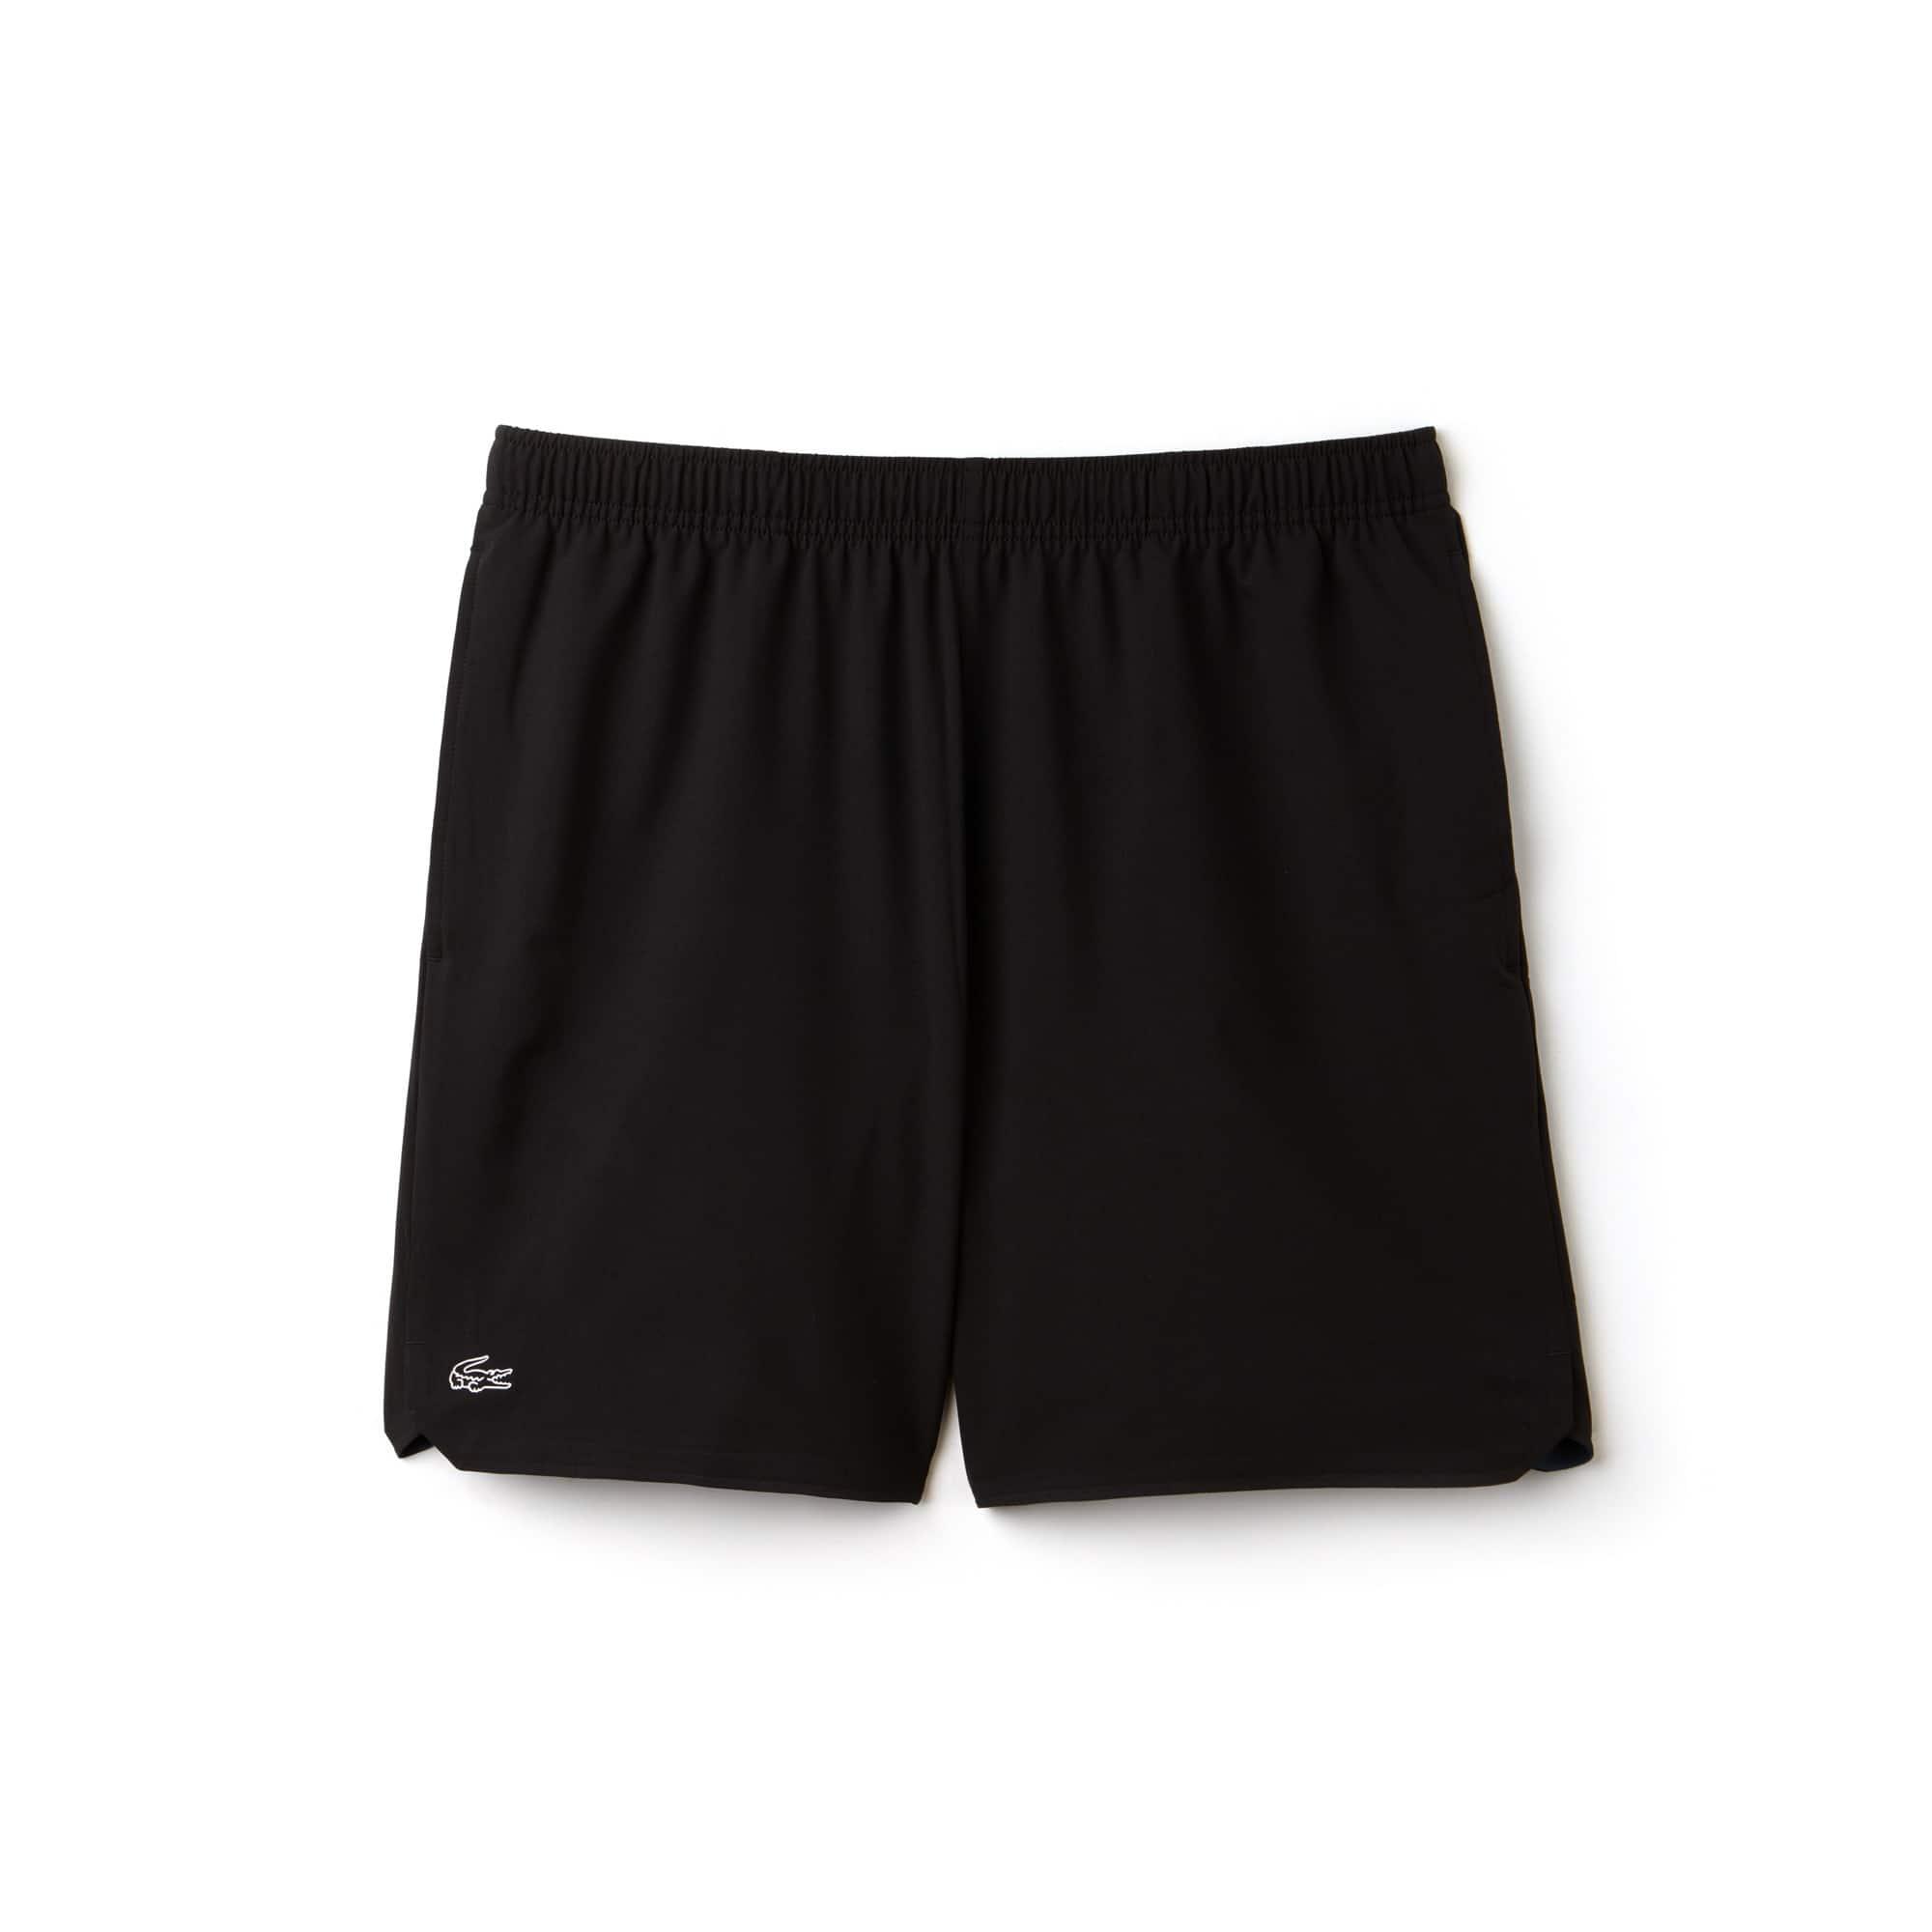 Pantalón corto técnico Tenis Lacoste SPORT liso